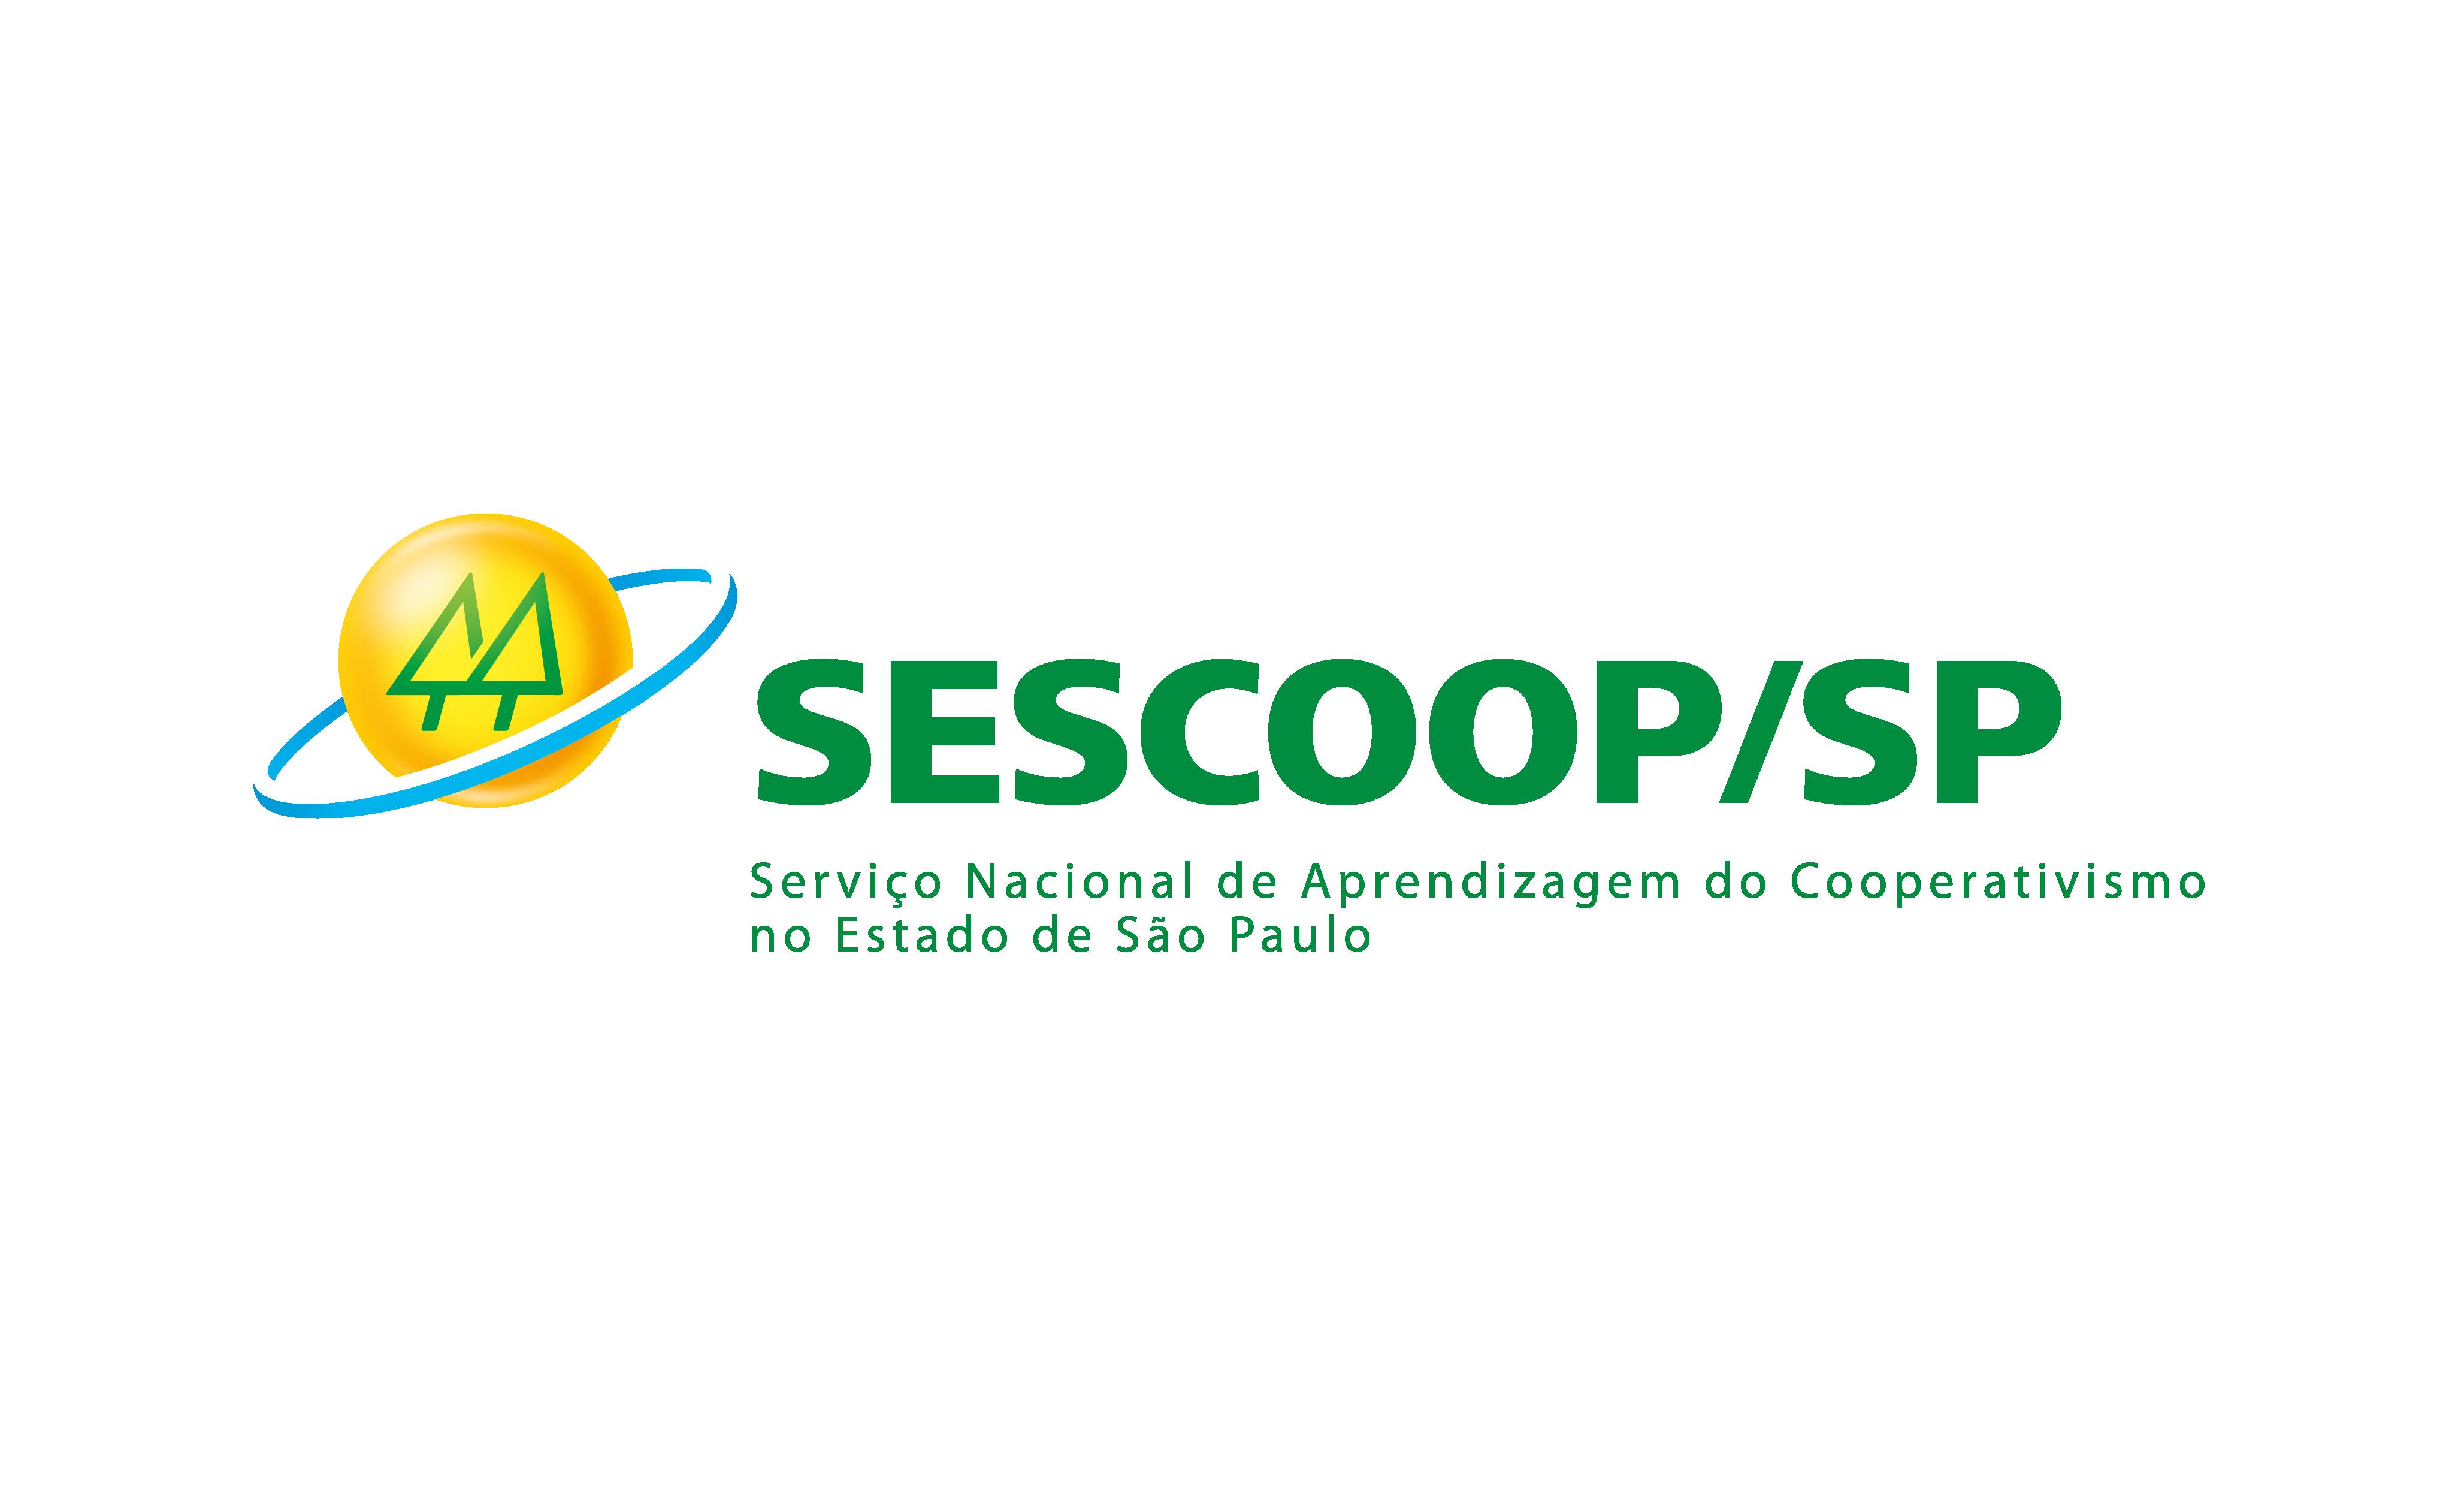 sescoopsp---logo-colorido--horizontal